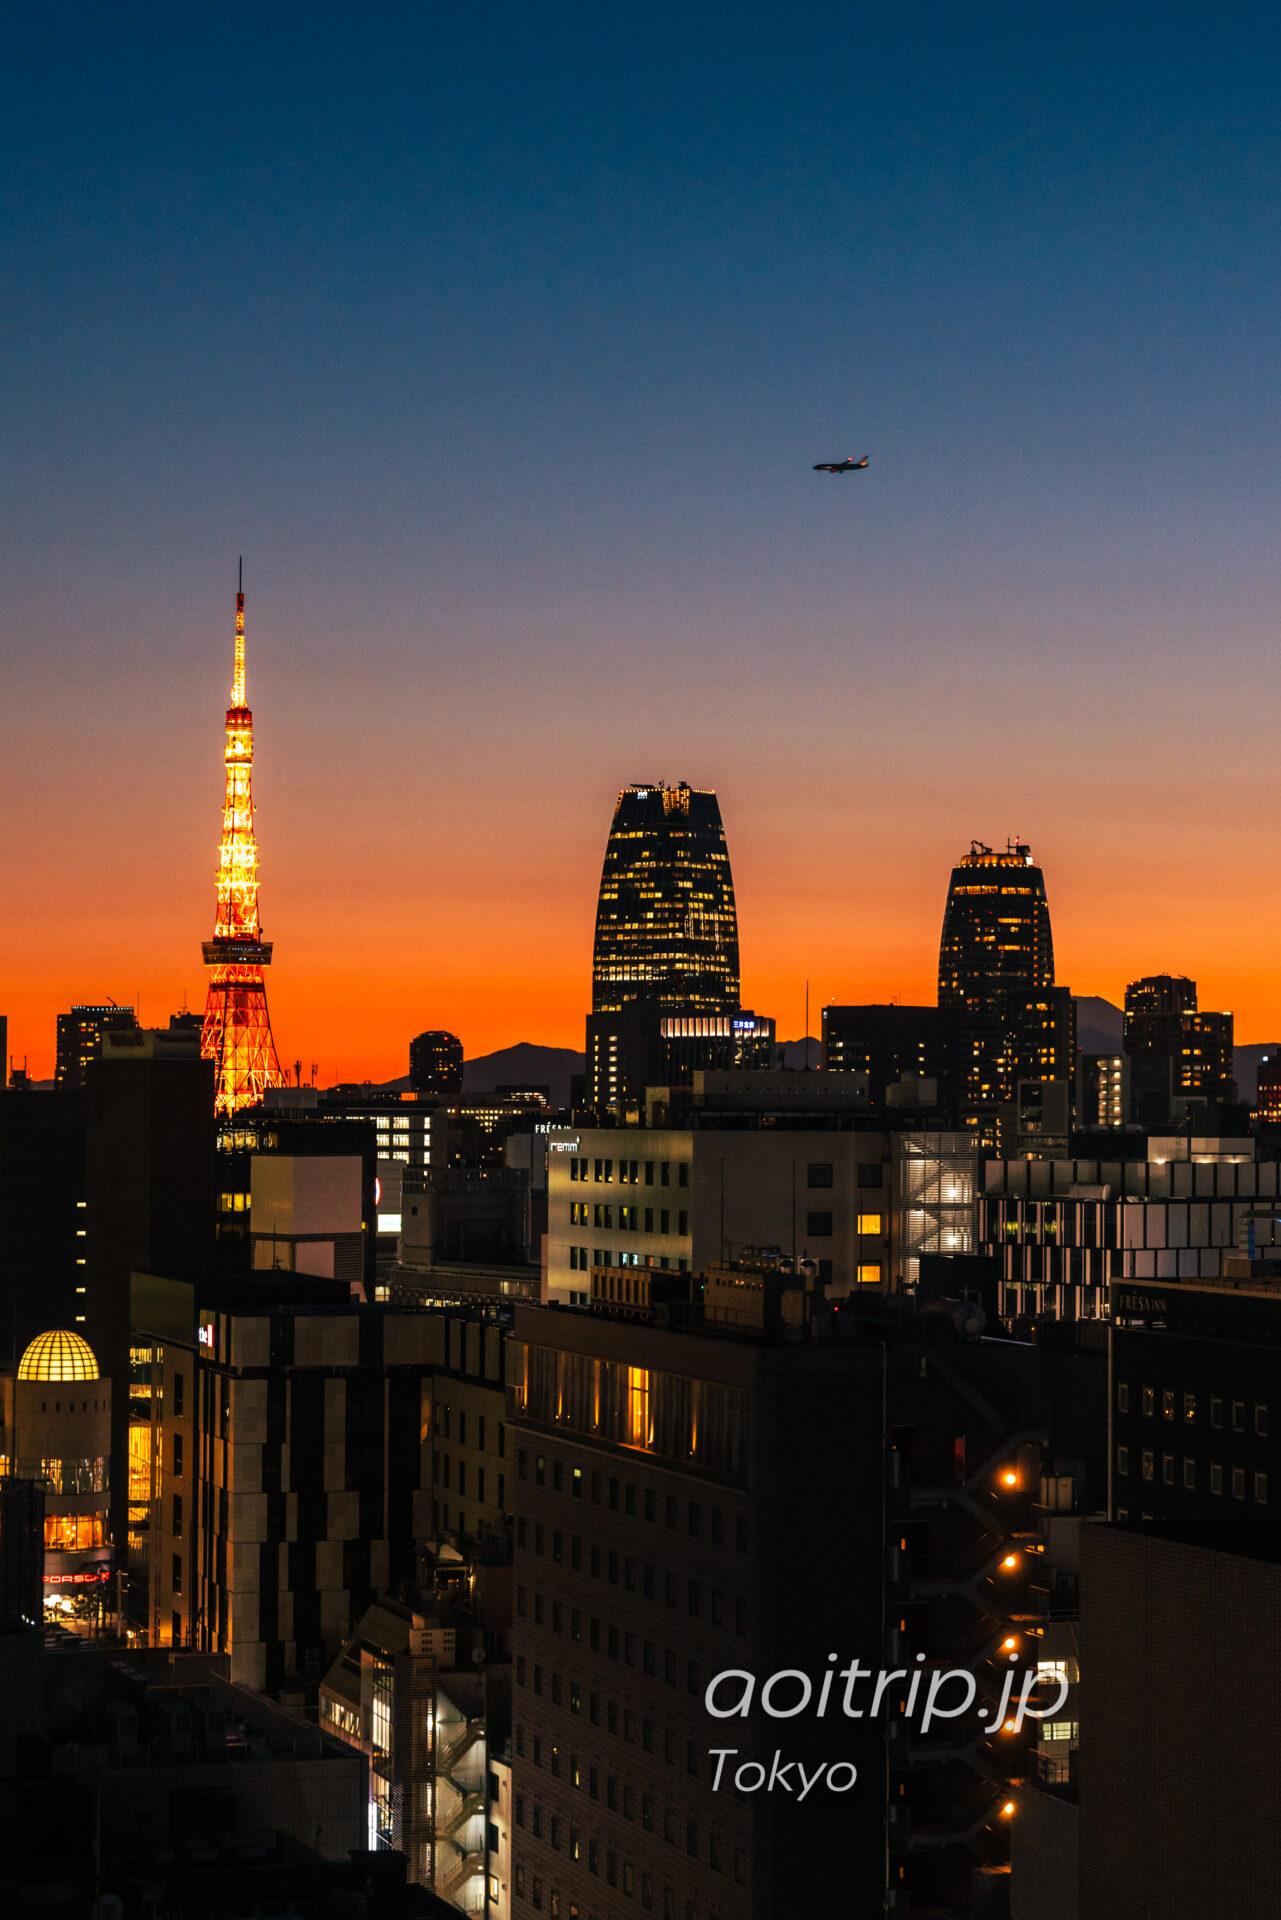 ACホテル東京銀座 AC Hotel Tokyo Ginza 屋上ルーフトップから東京タワーと富士山・大山を望む